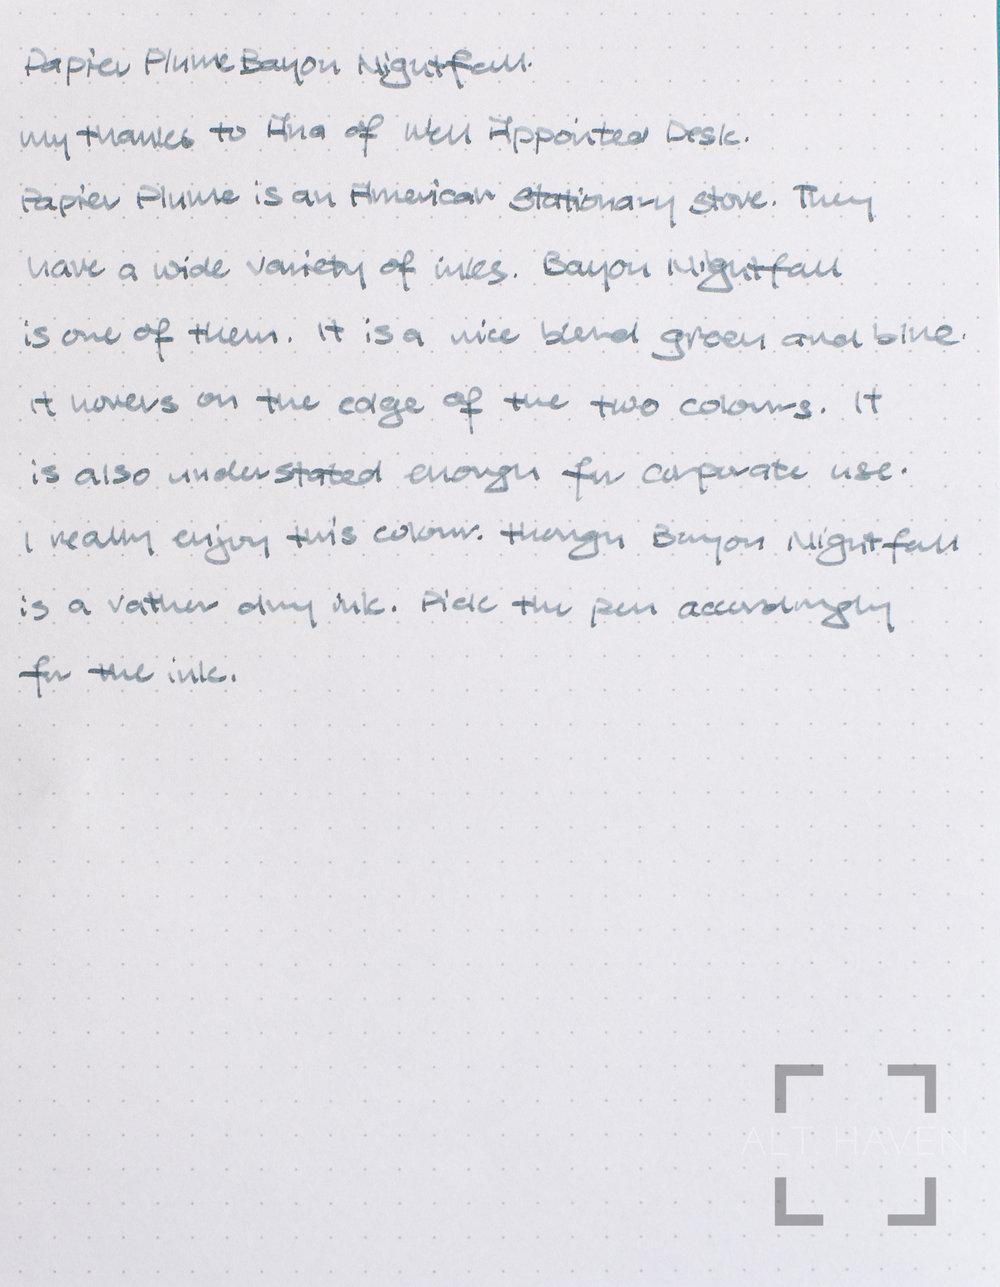 Papier Plume Bayou Nightfall-2.jpg